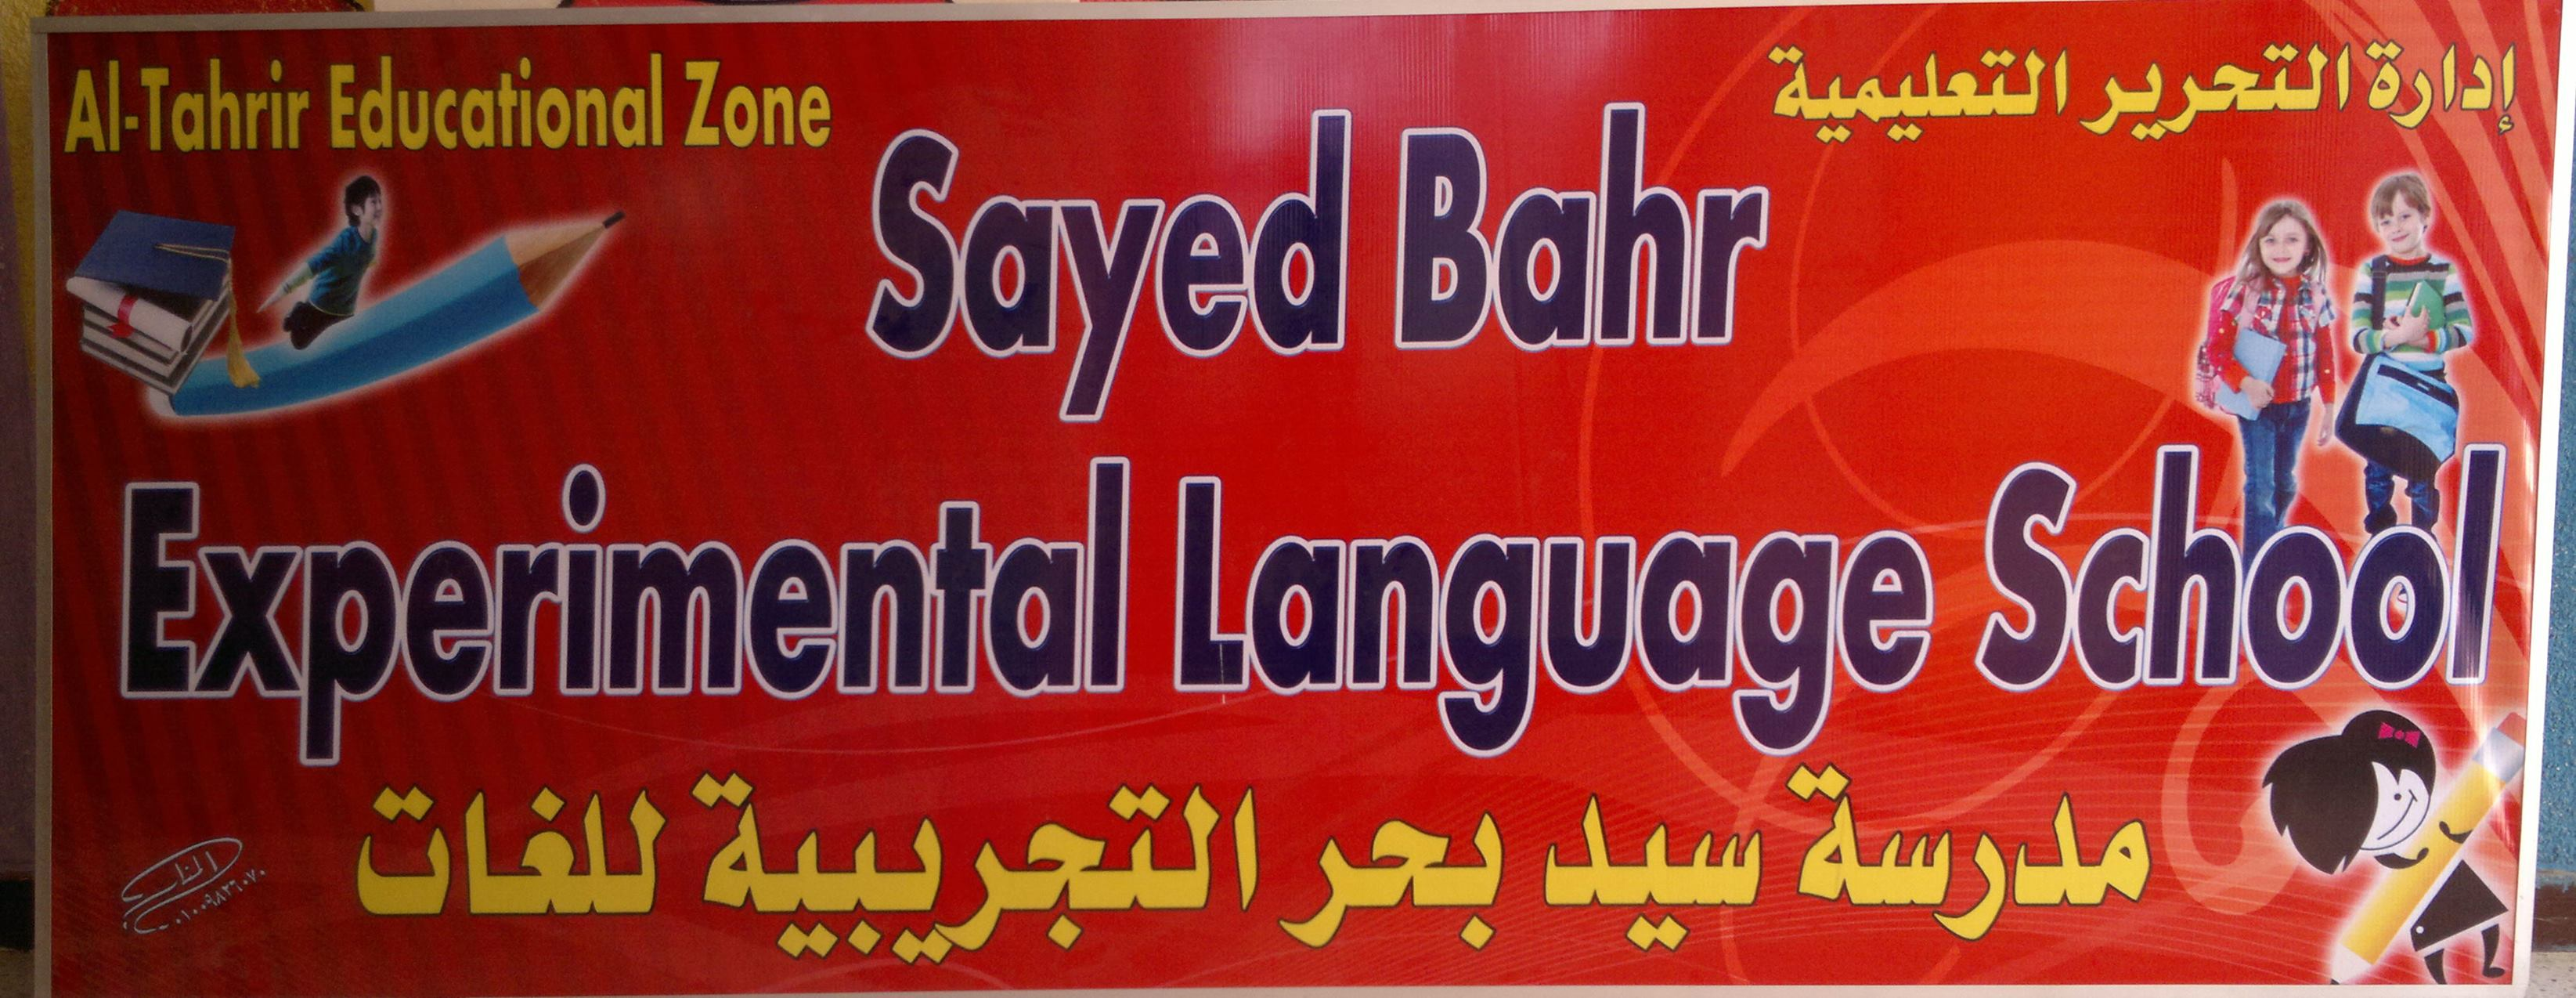 Sayed Bahar Primary Experimental School